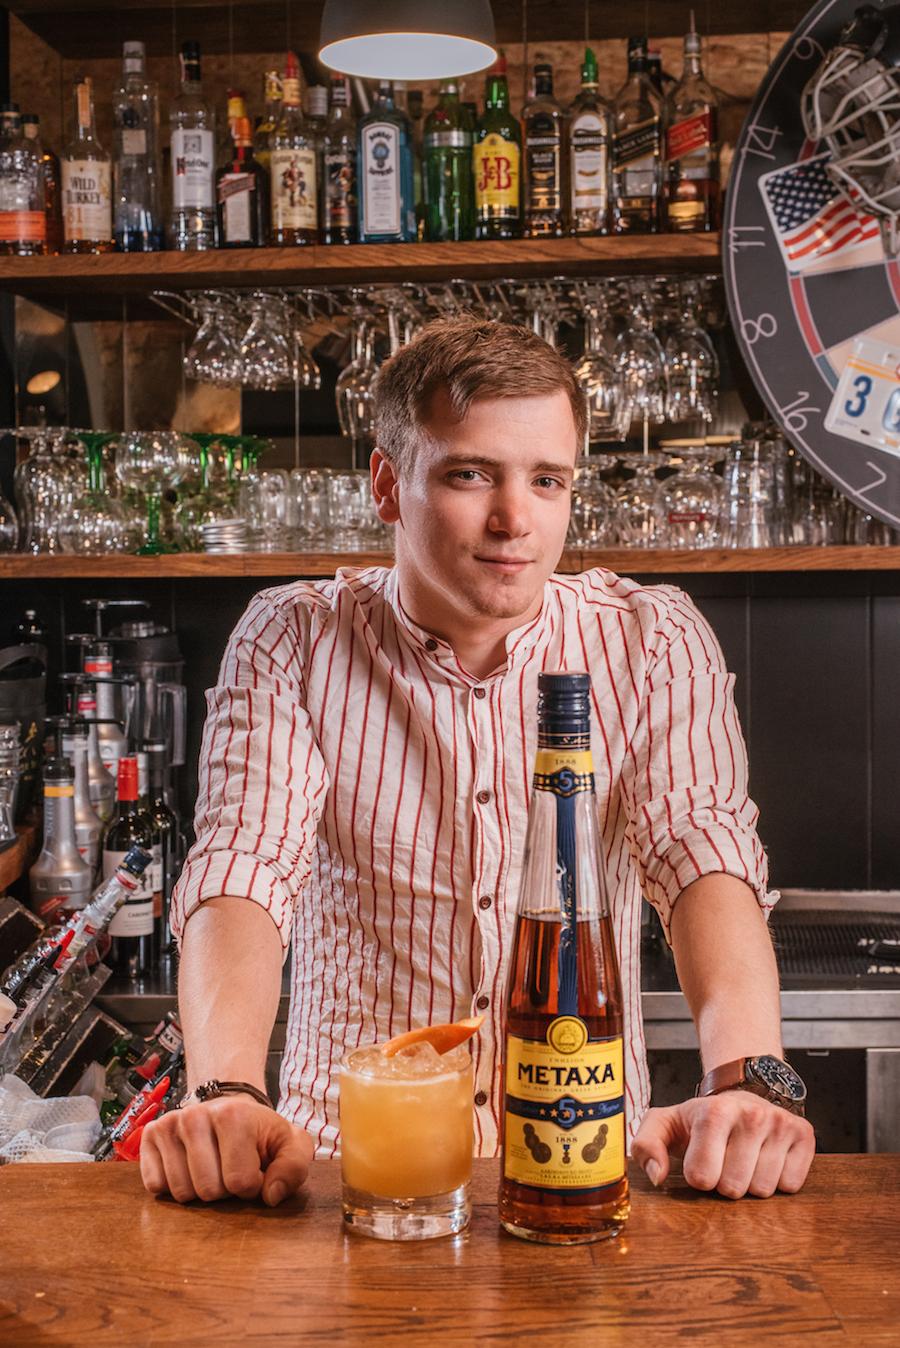 Ateista - Metaxa, naranča, limun, tonka sirup